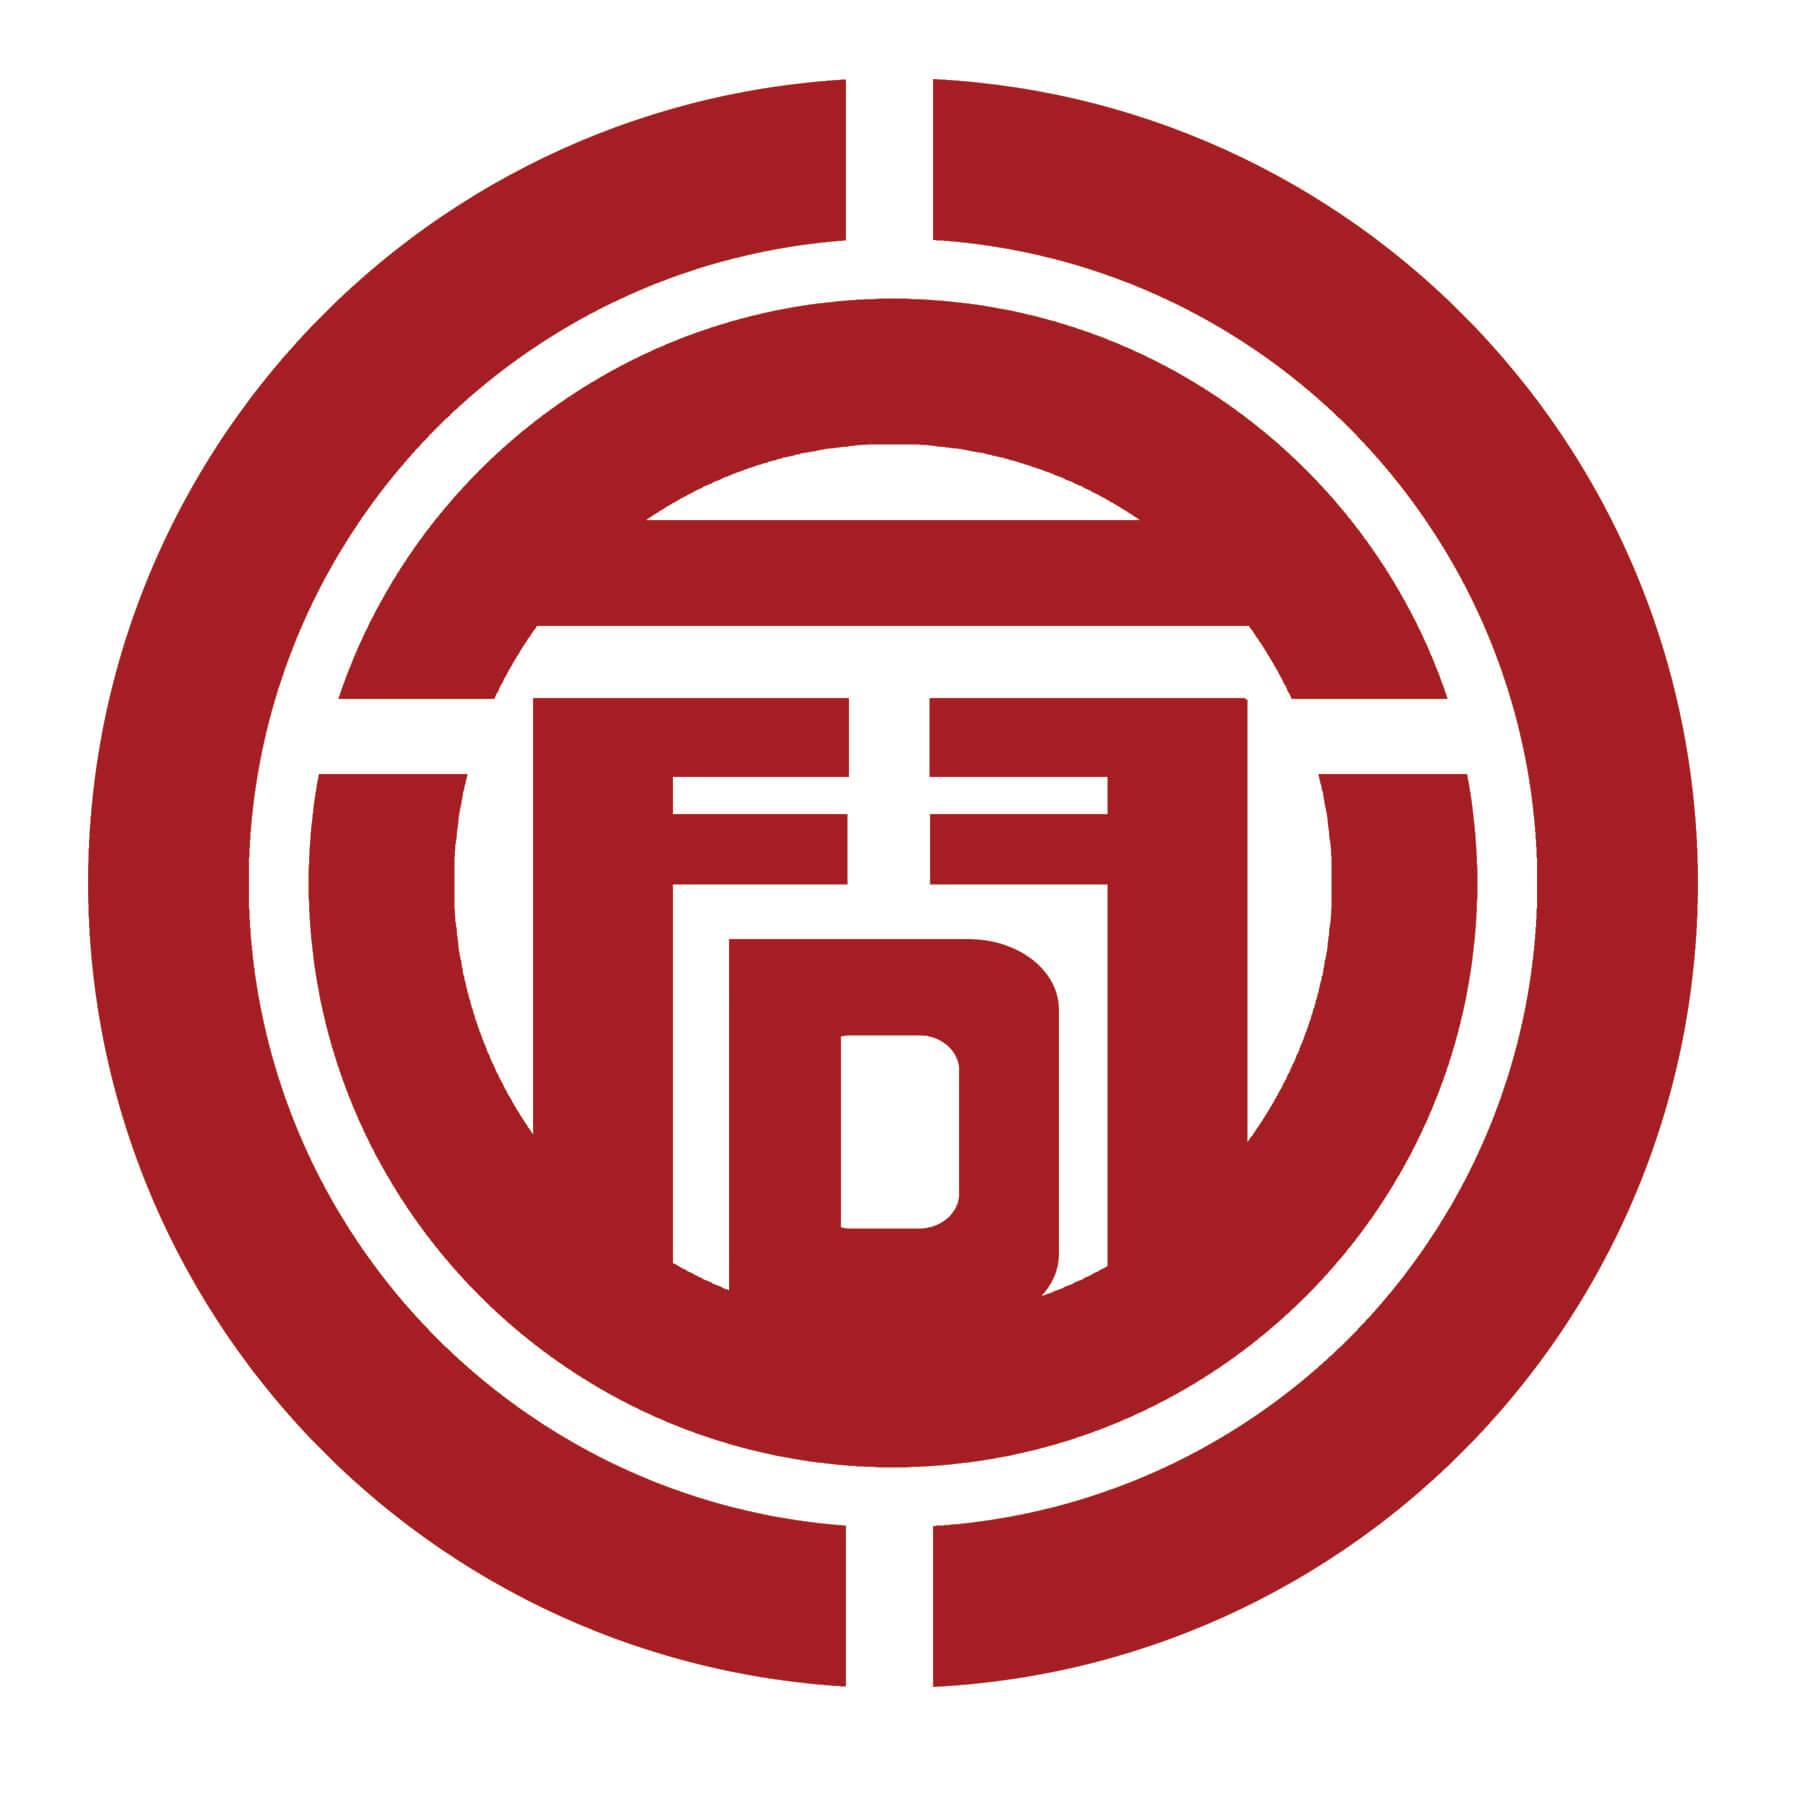 flat solid red affd logo.jpg